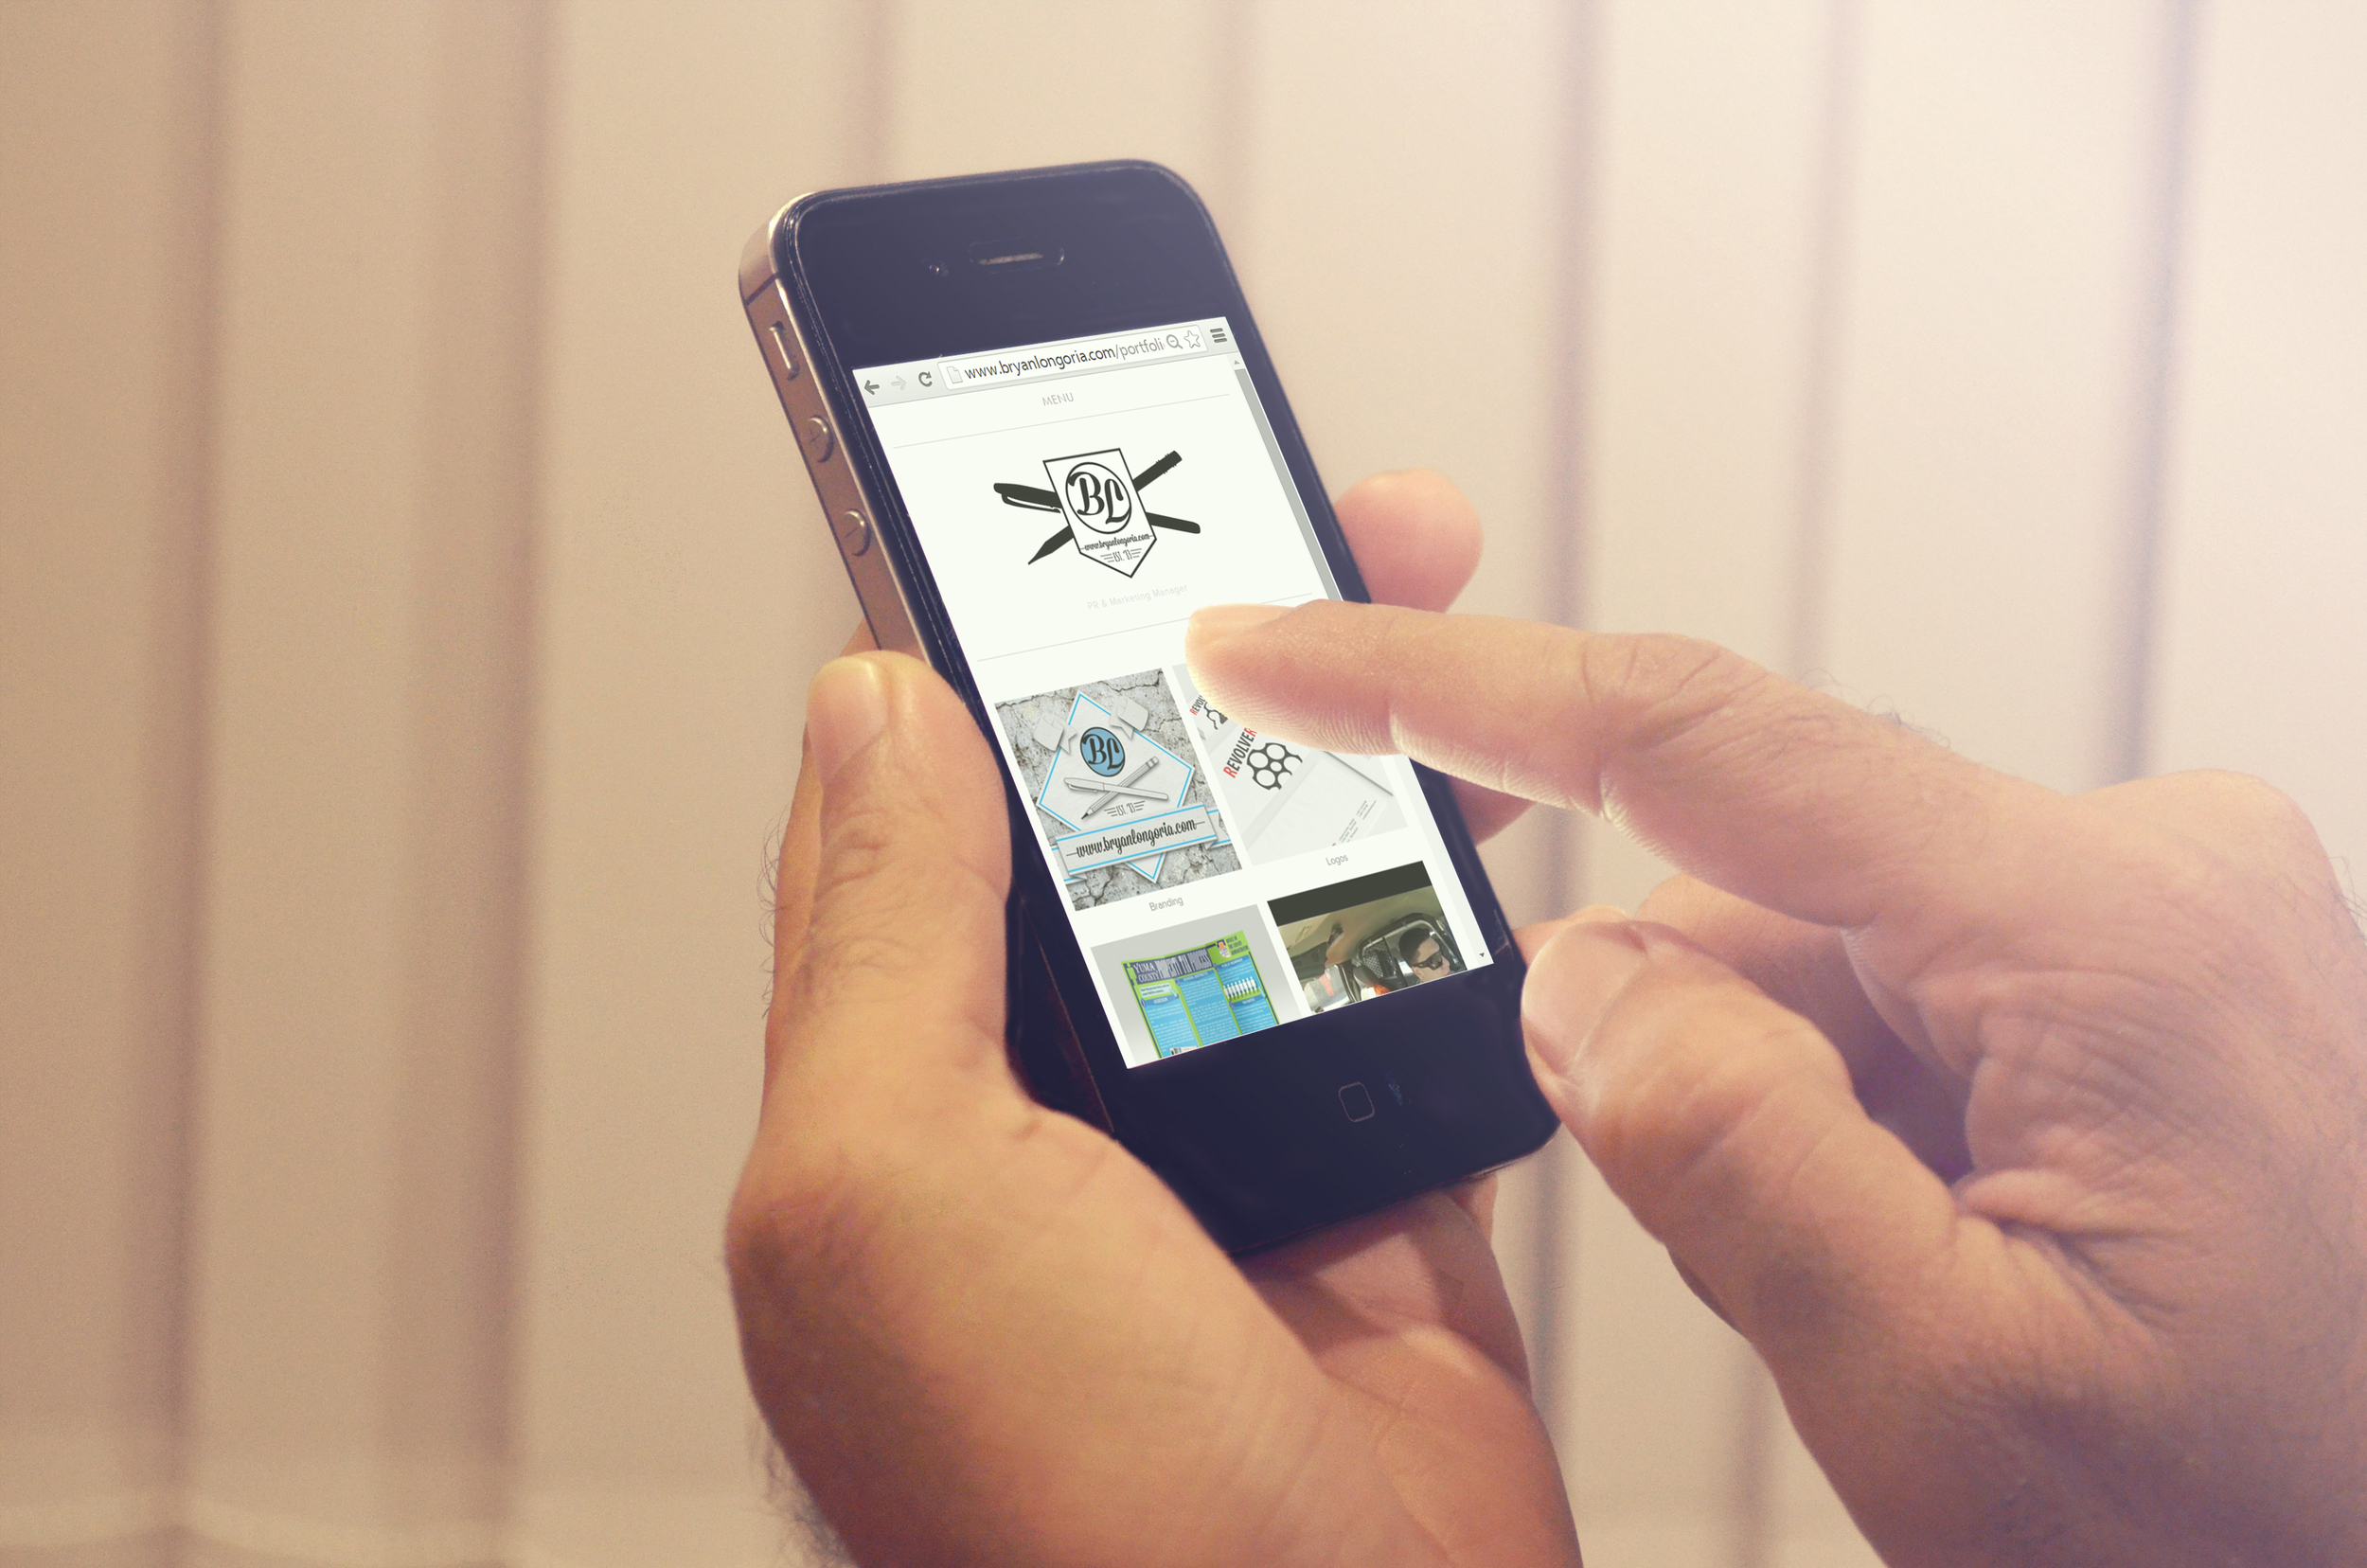 Free Photo-Real iPhone 5 PSD Mockup